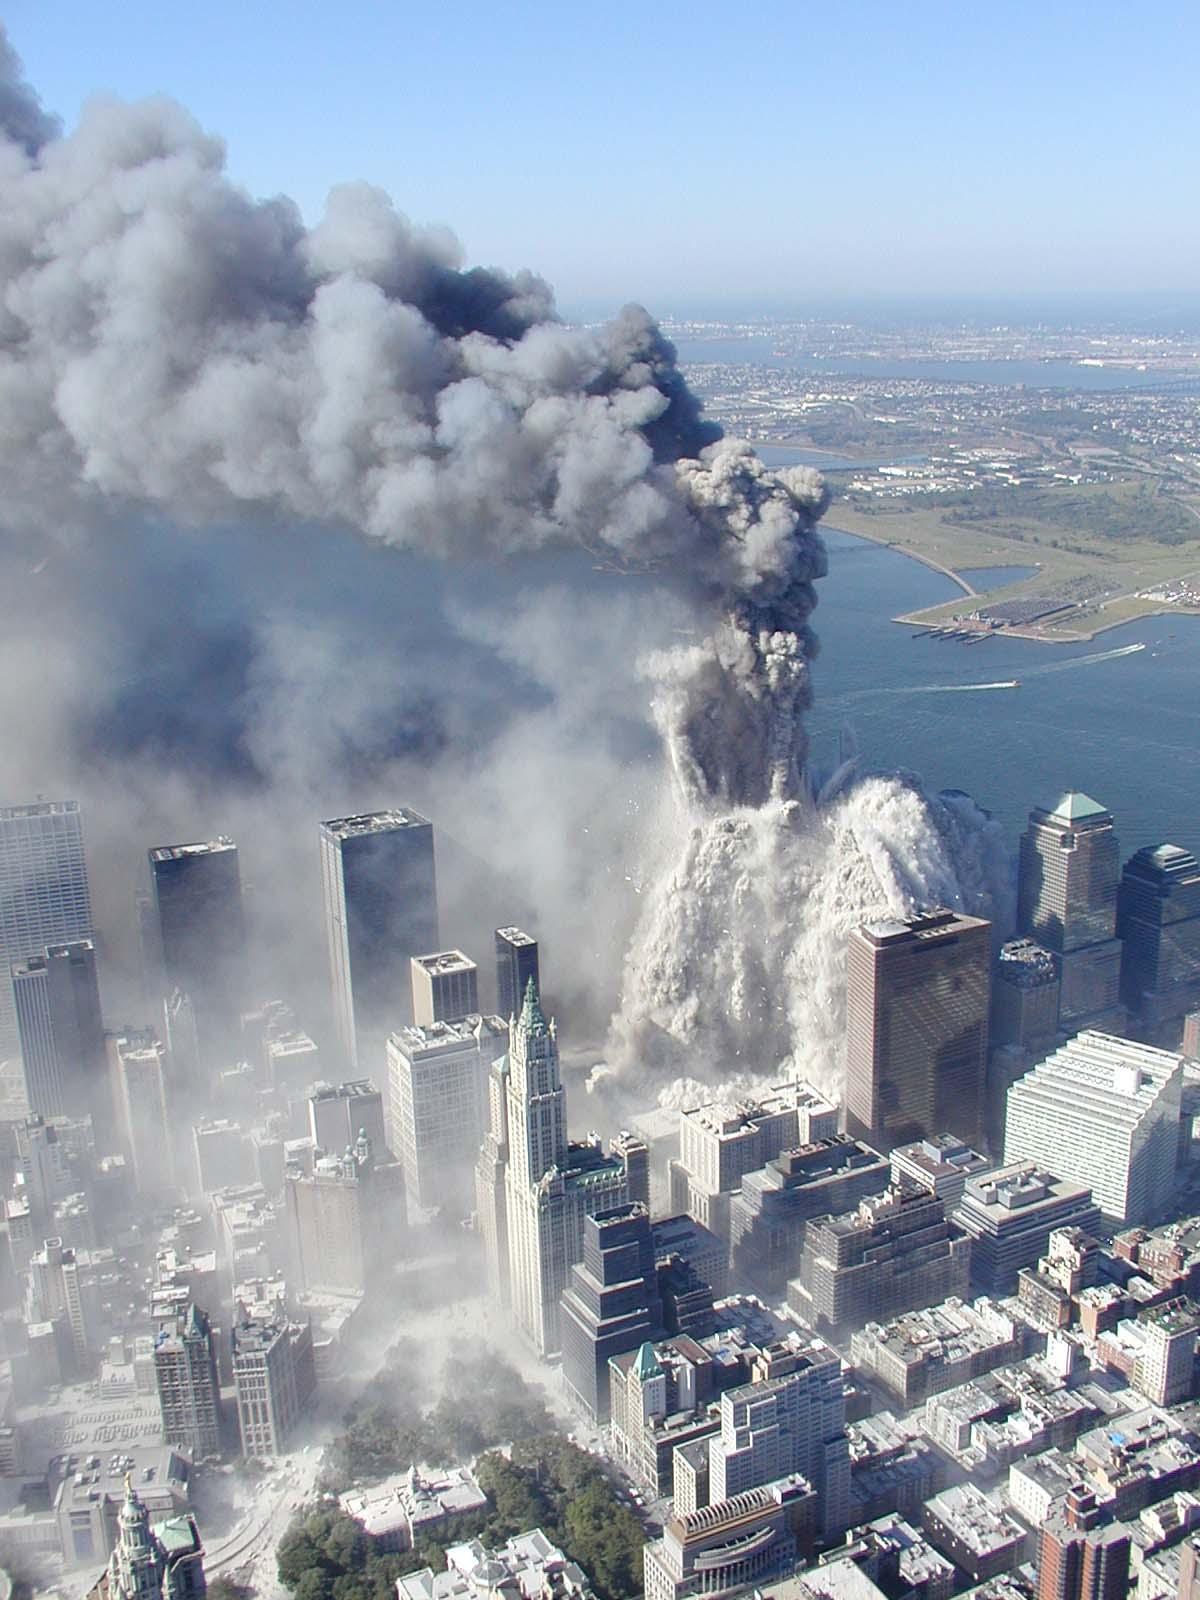 Tangible Information: Leuren Moret MOLECULAR WEAPON at 911 WTC 9 Photos